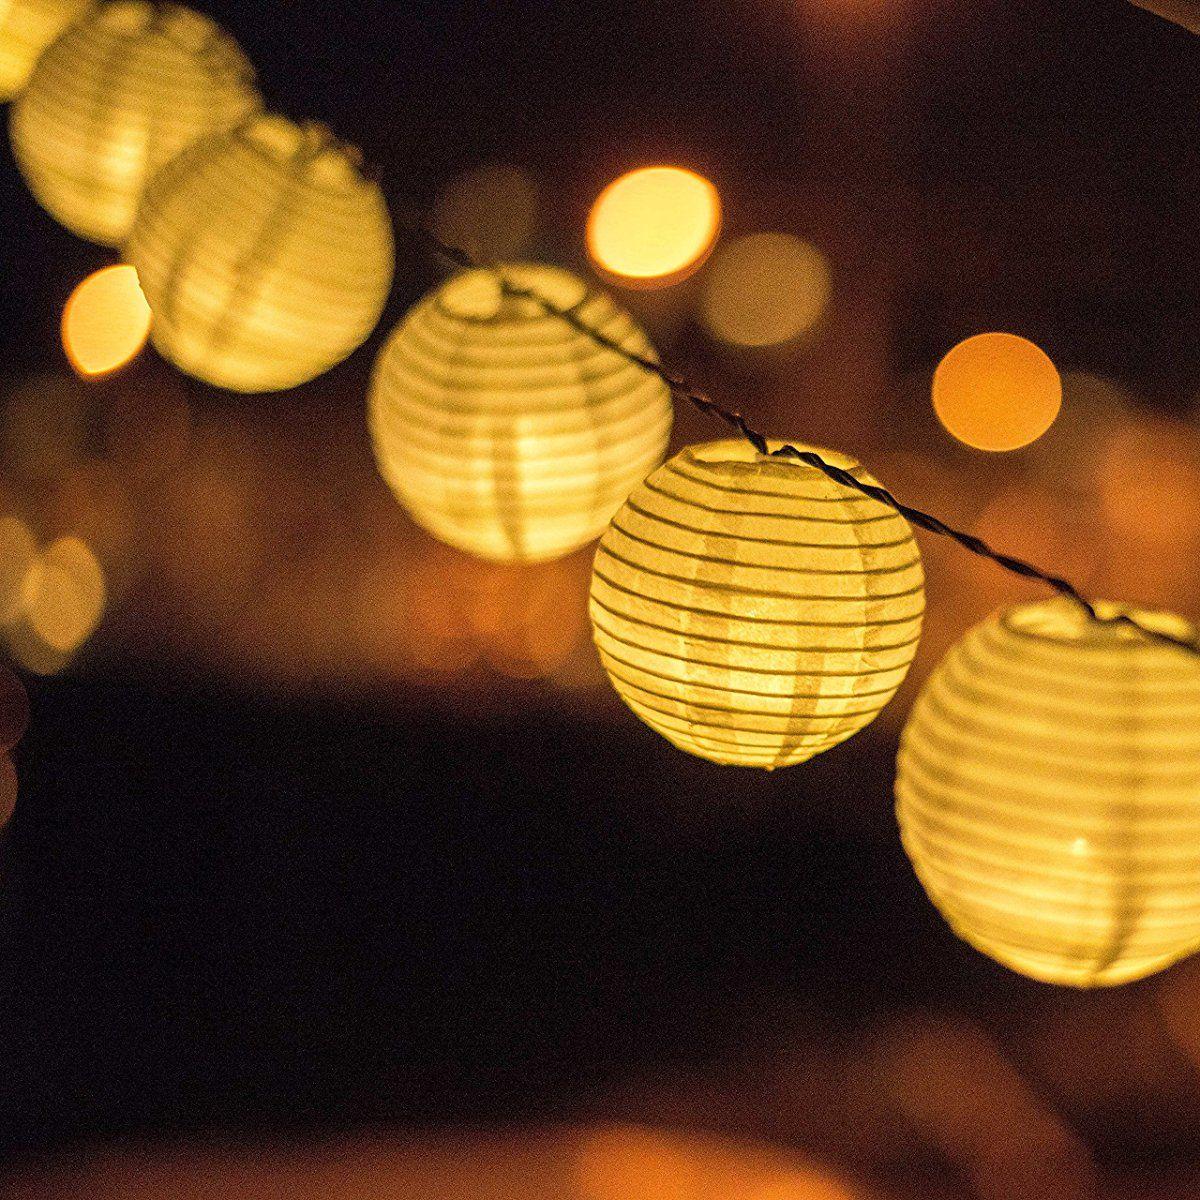 Solar powered lanterns string lights outdoor lighting 25 led solar powered lanterns string lights outdoor lighting 25 led globe lights per string aloadofball Choice Image